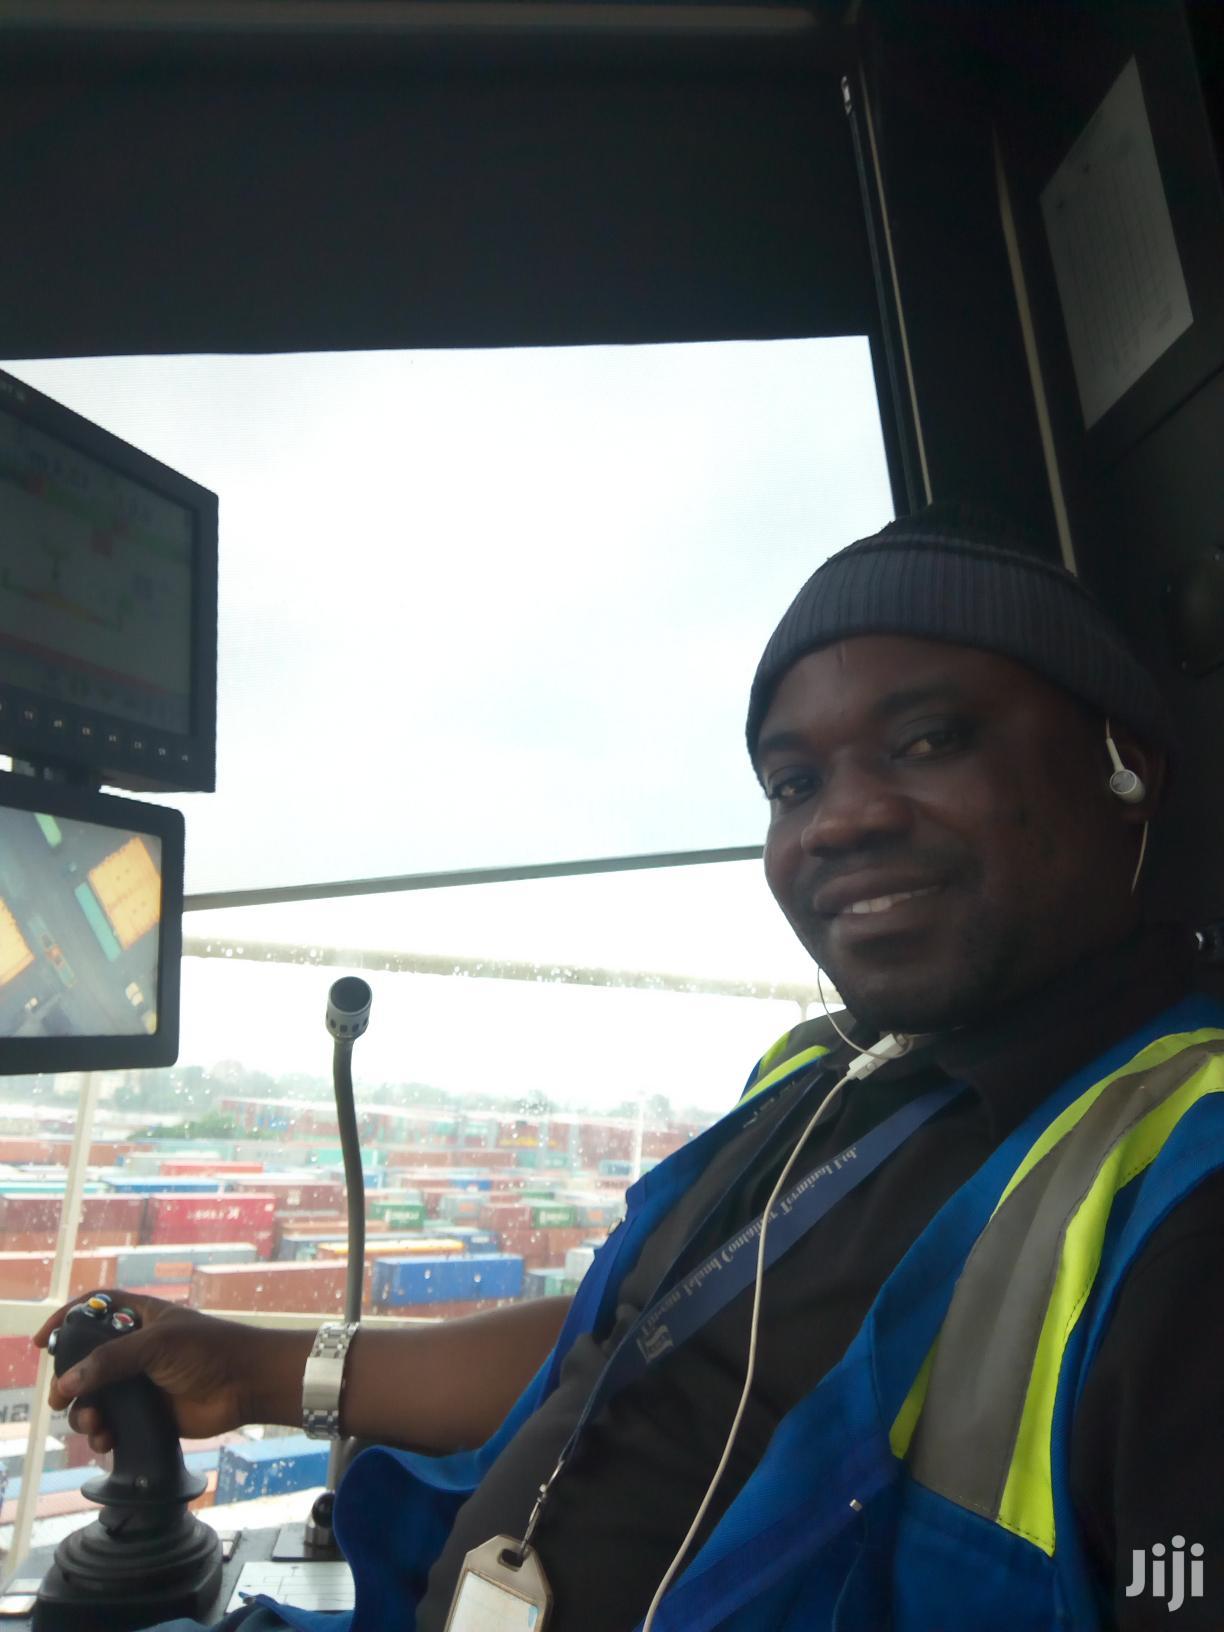 Crane Operator | Logistics & Transportation CVs for sale in Sapele, Delta State, Nigeria